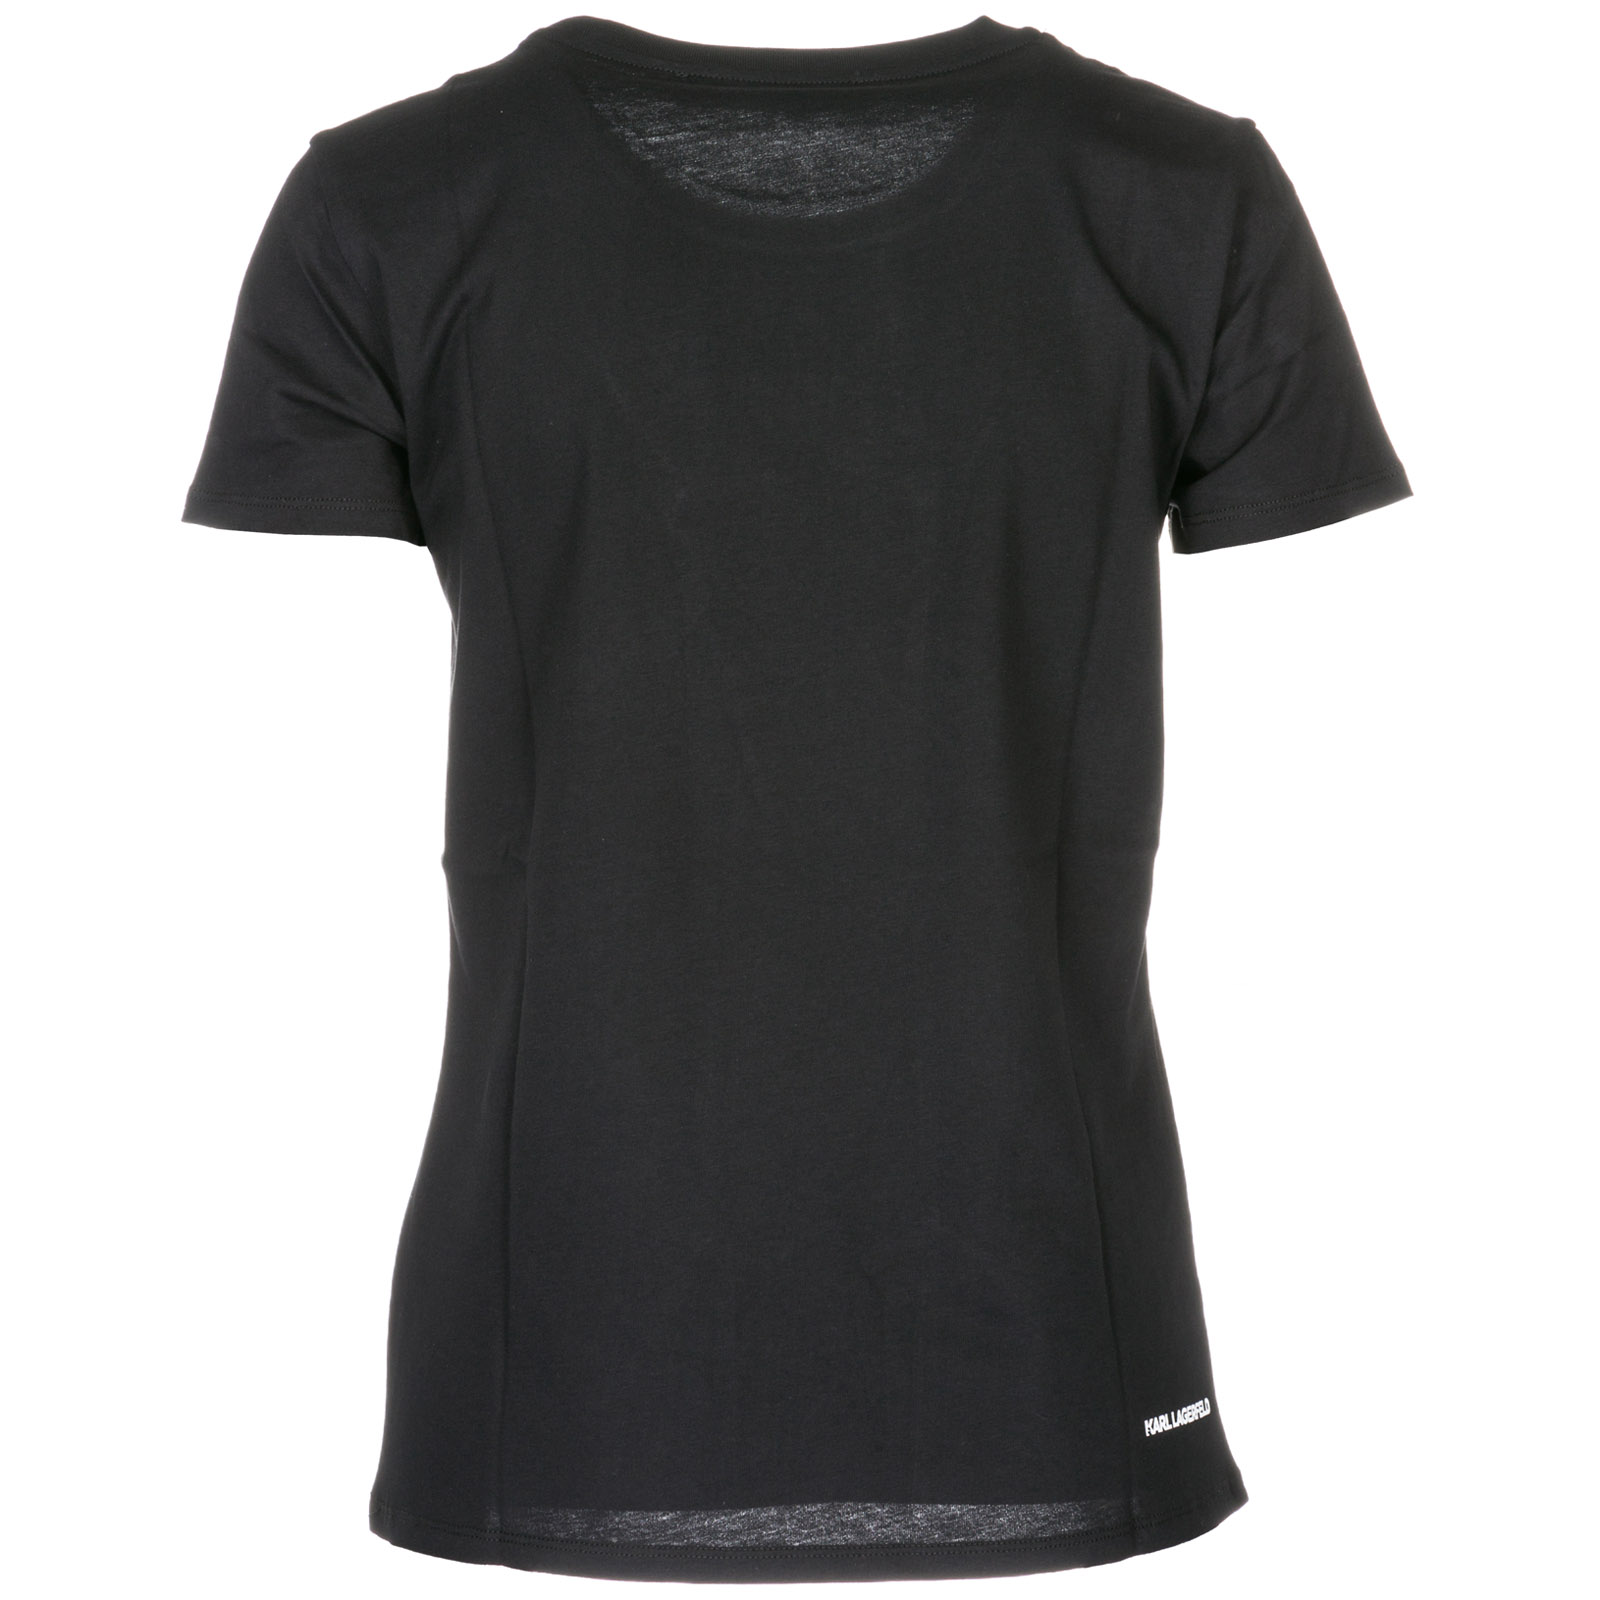 Women's t-shirt short sleeve crew neck round ikonik